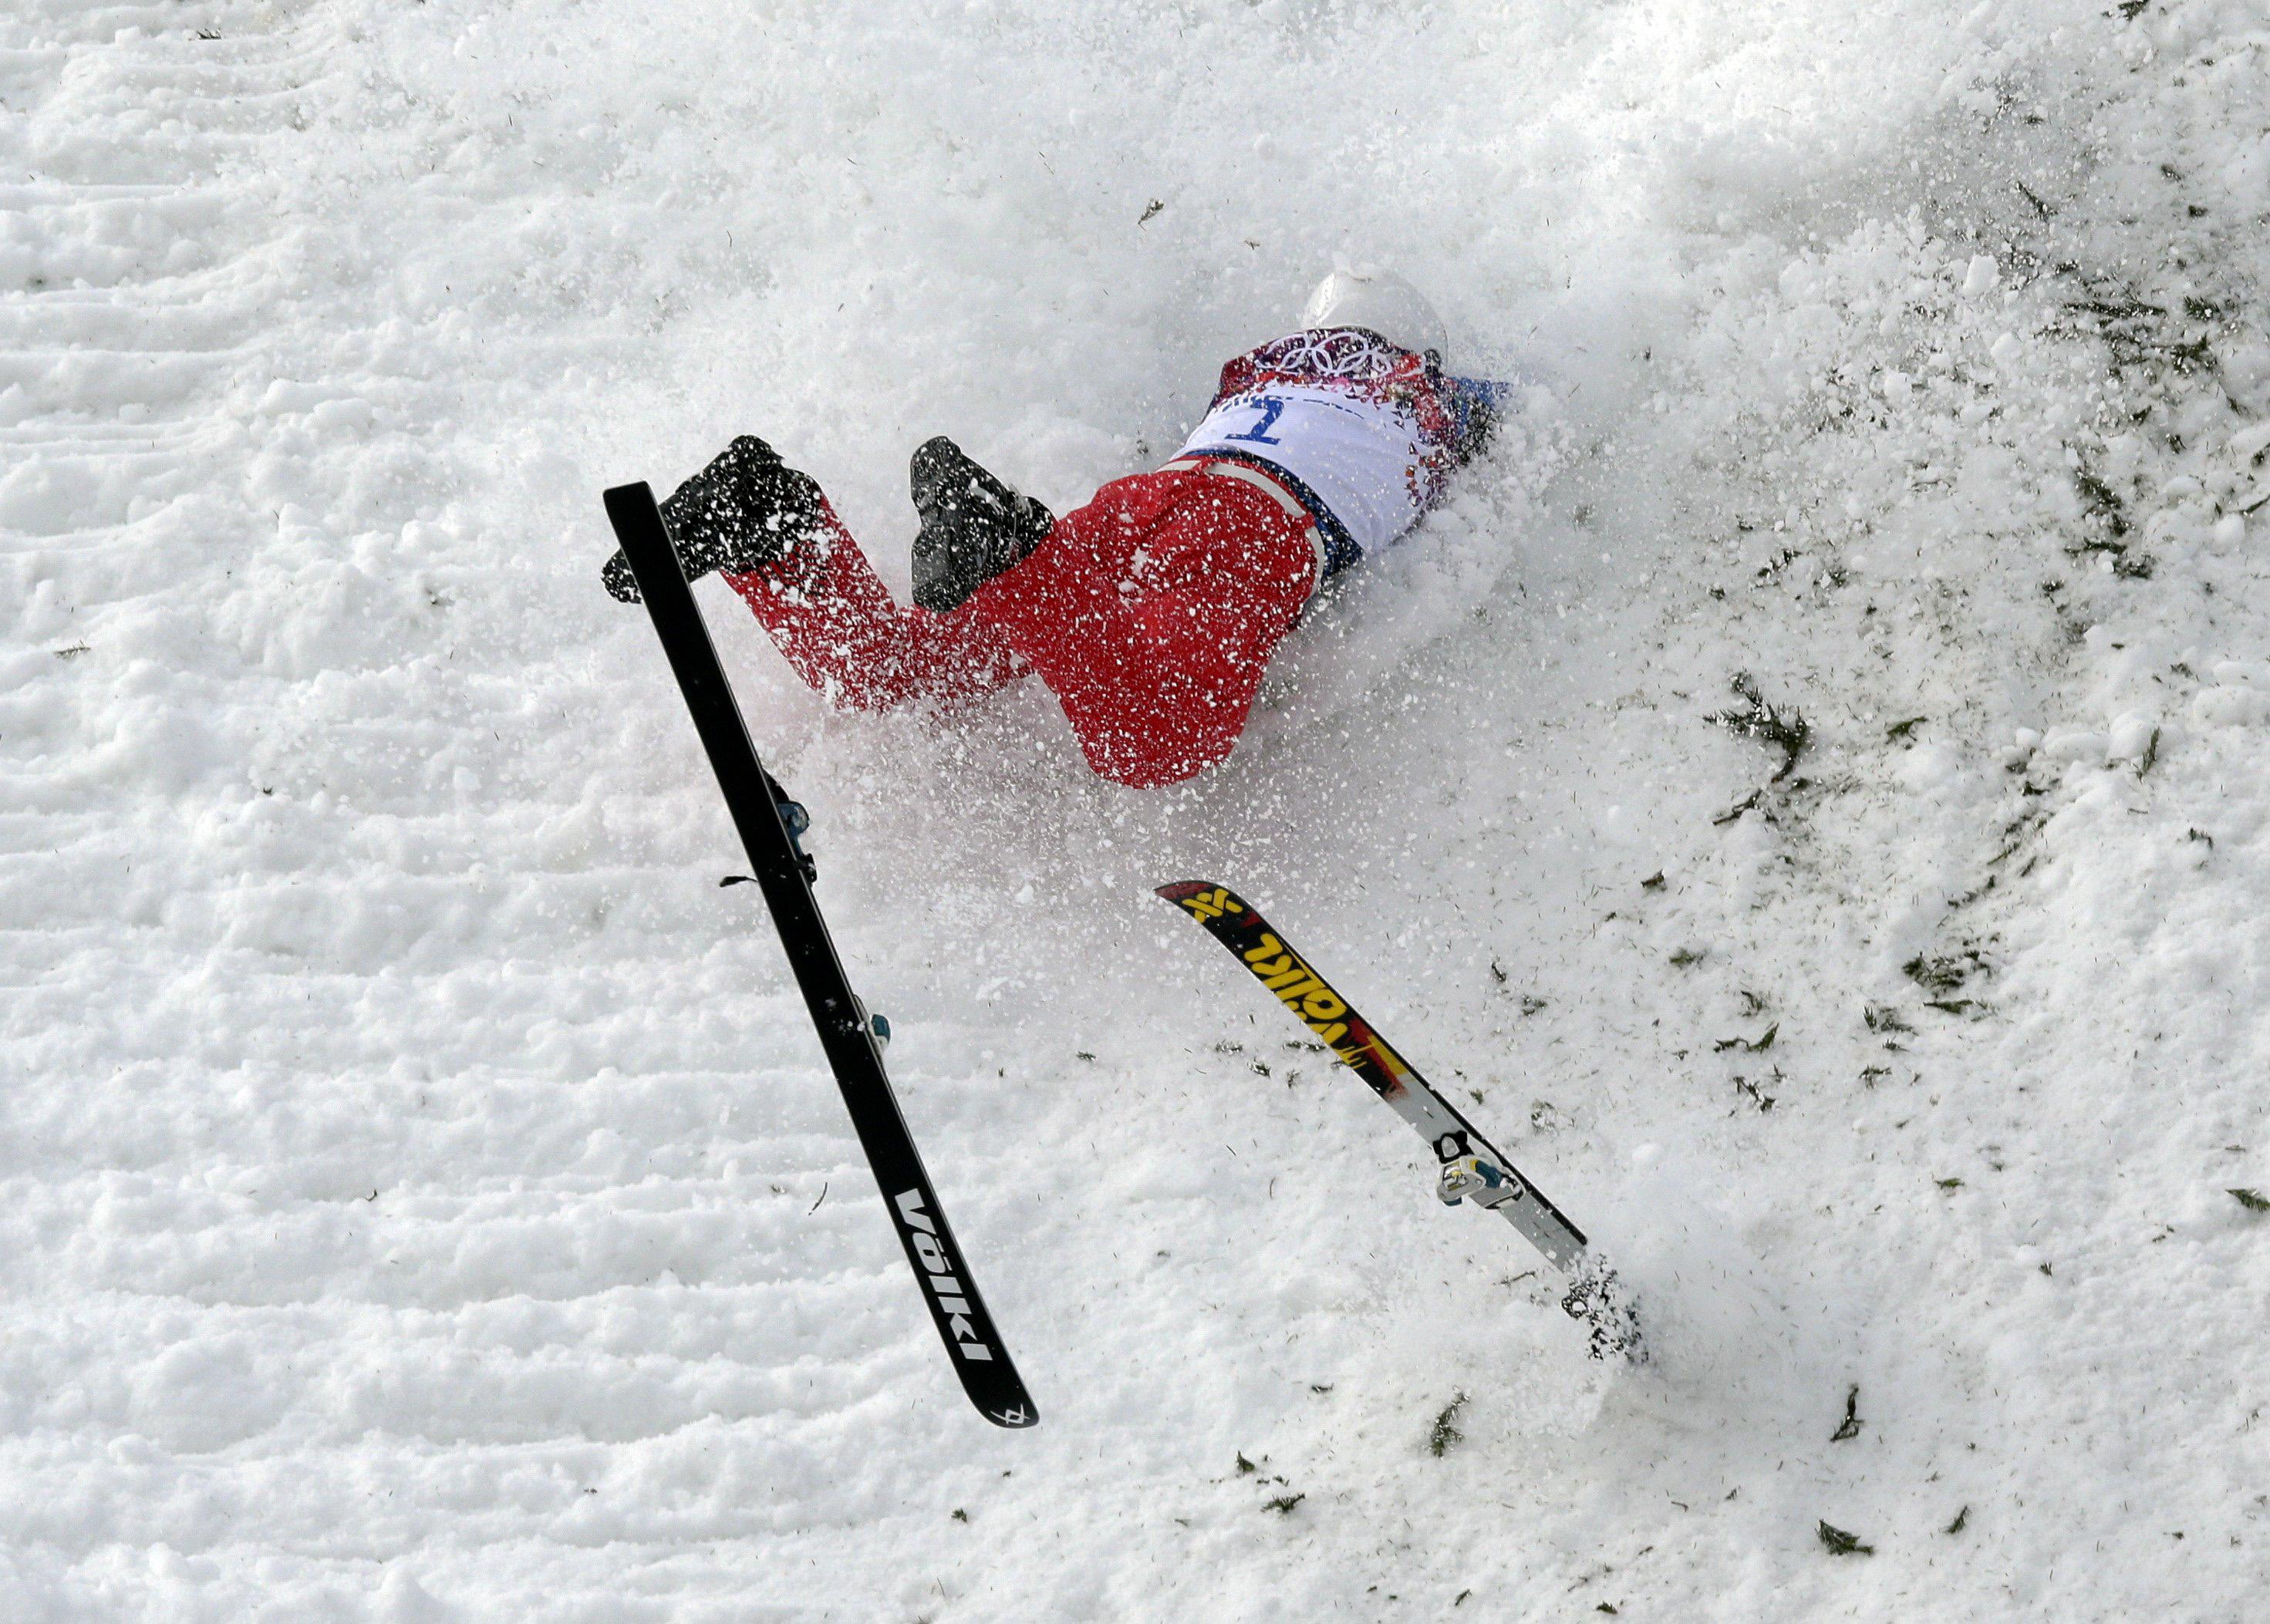 China's Liu Zhongqing crashes during freestyle skiing aerials training at the Rosa Khutor Extreme Park.